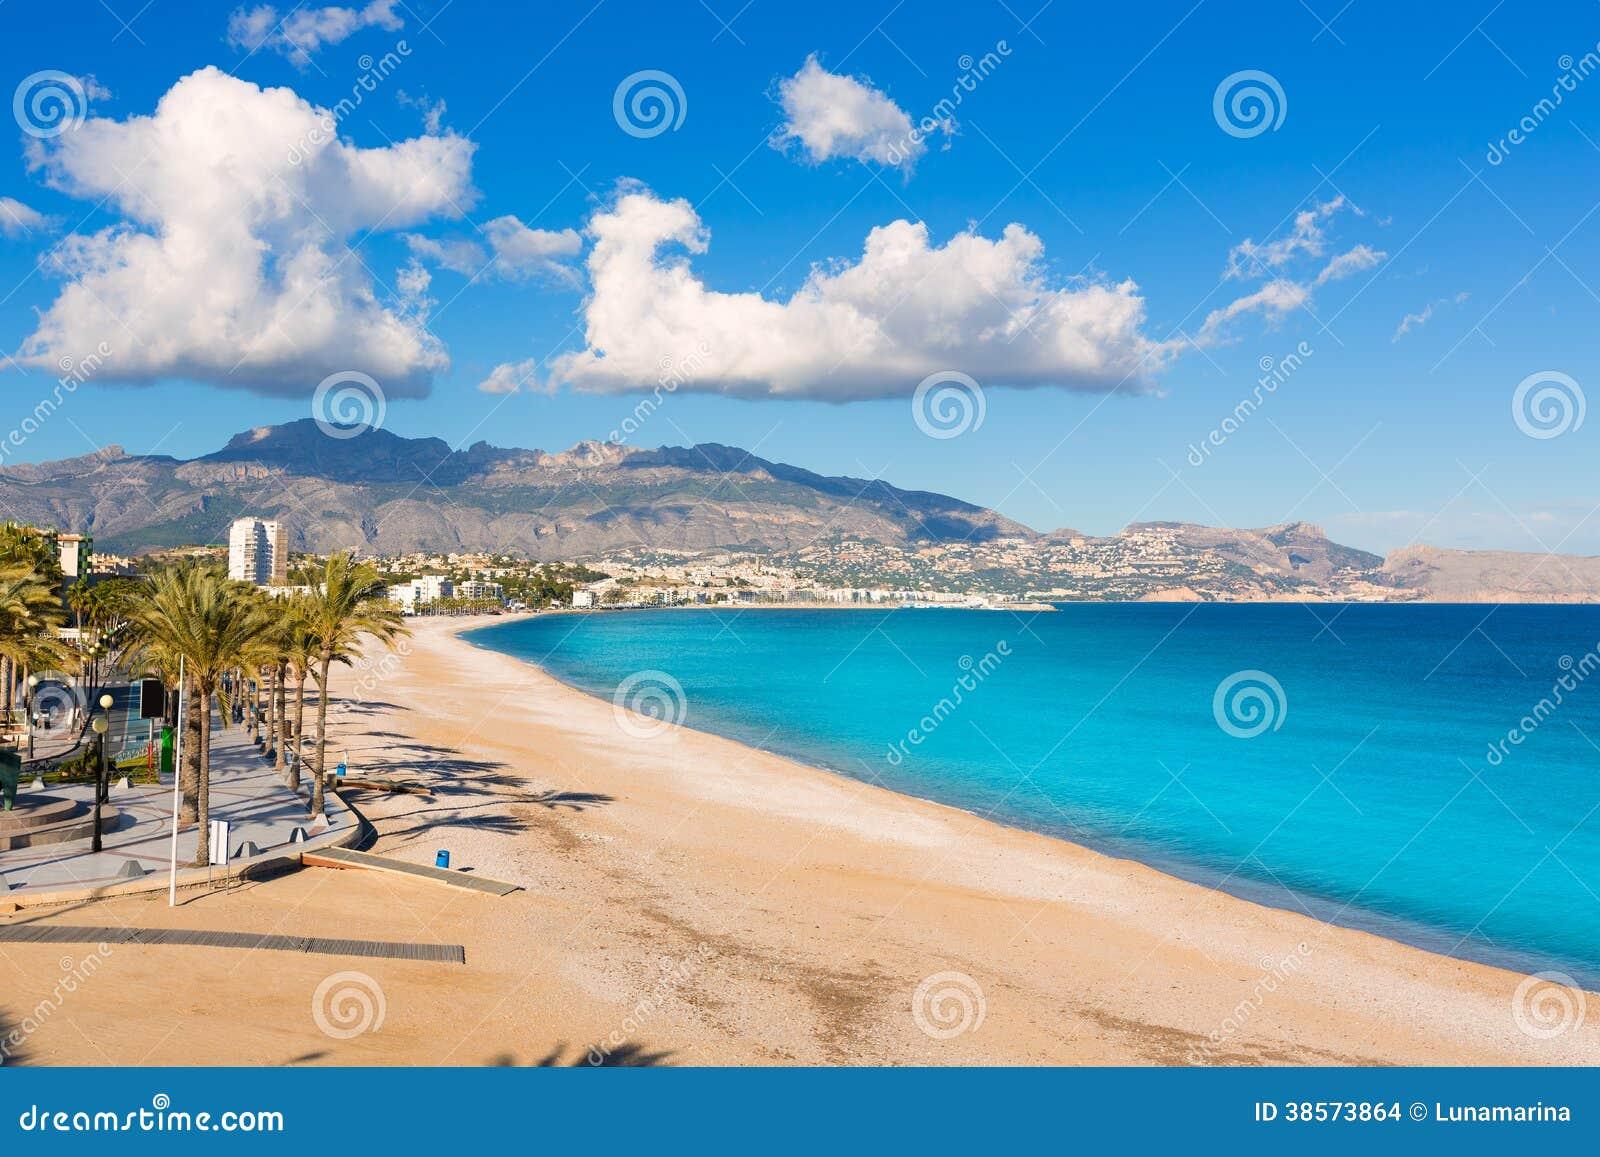 Oppdatert Altea Playa Del Albir Of White Stones In Alicante Stock Photo VY-14